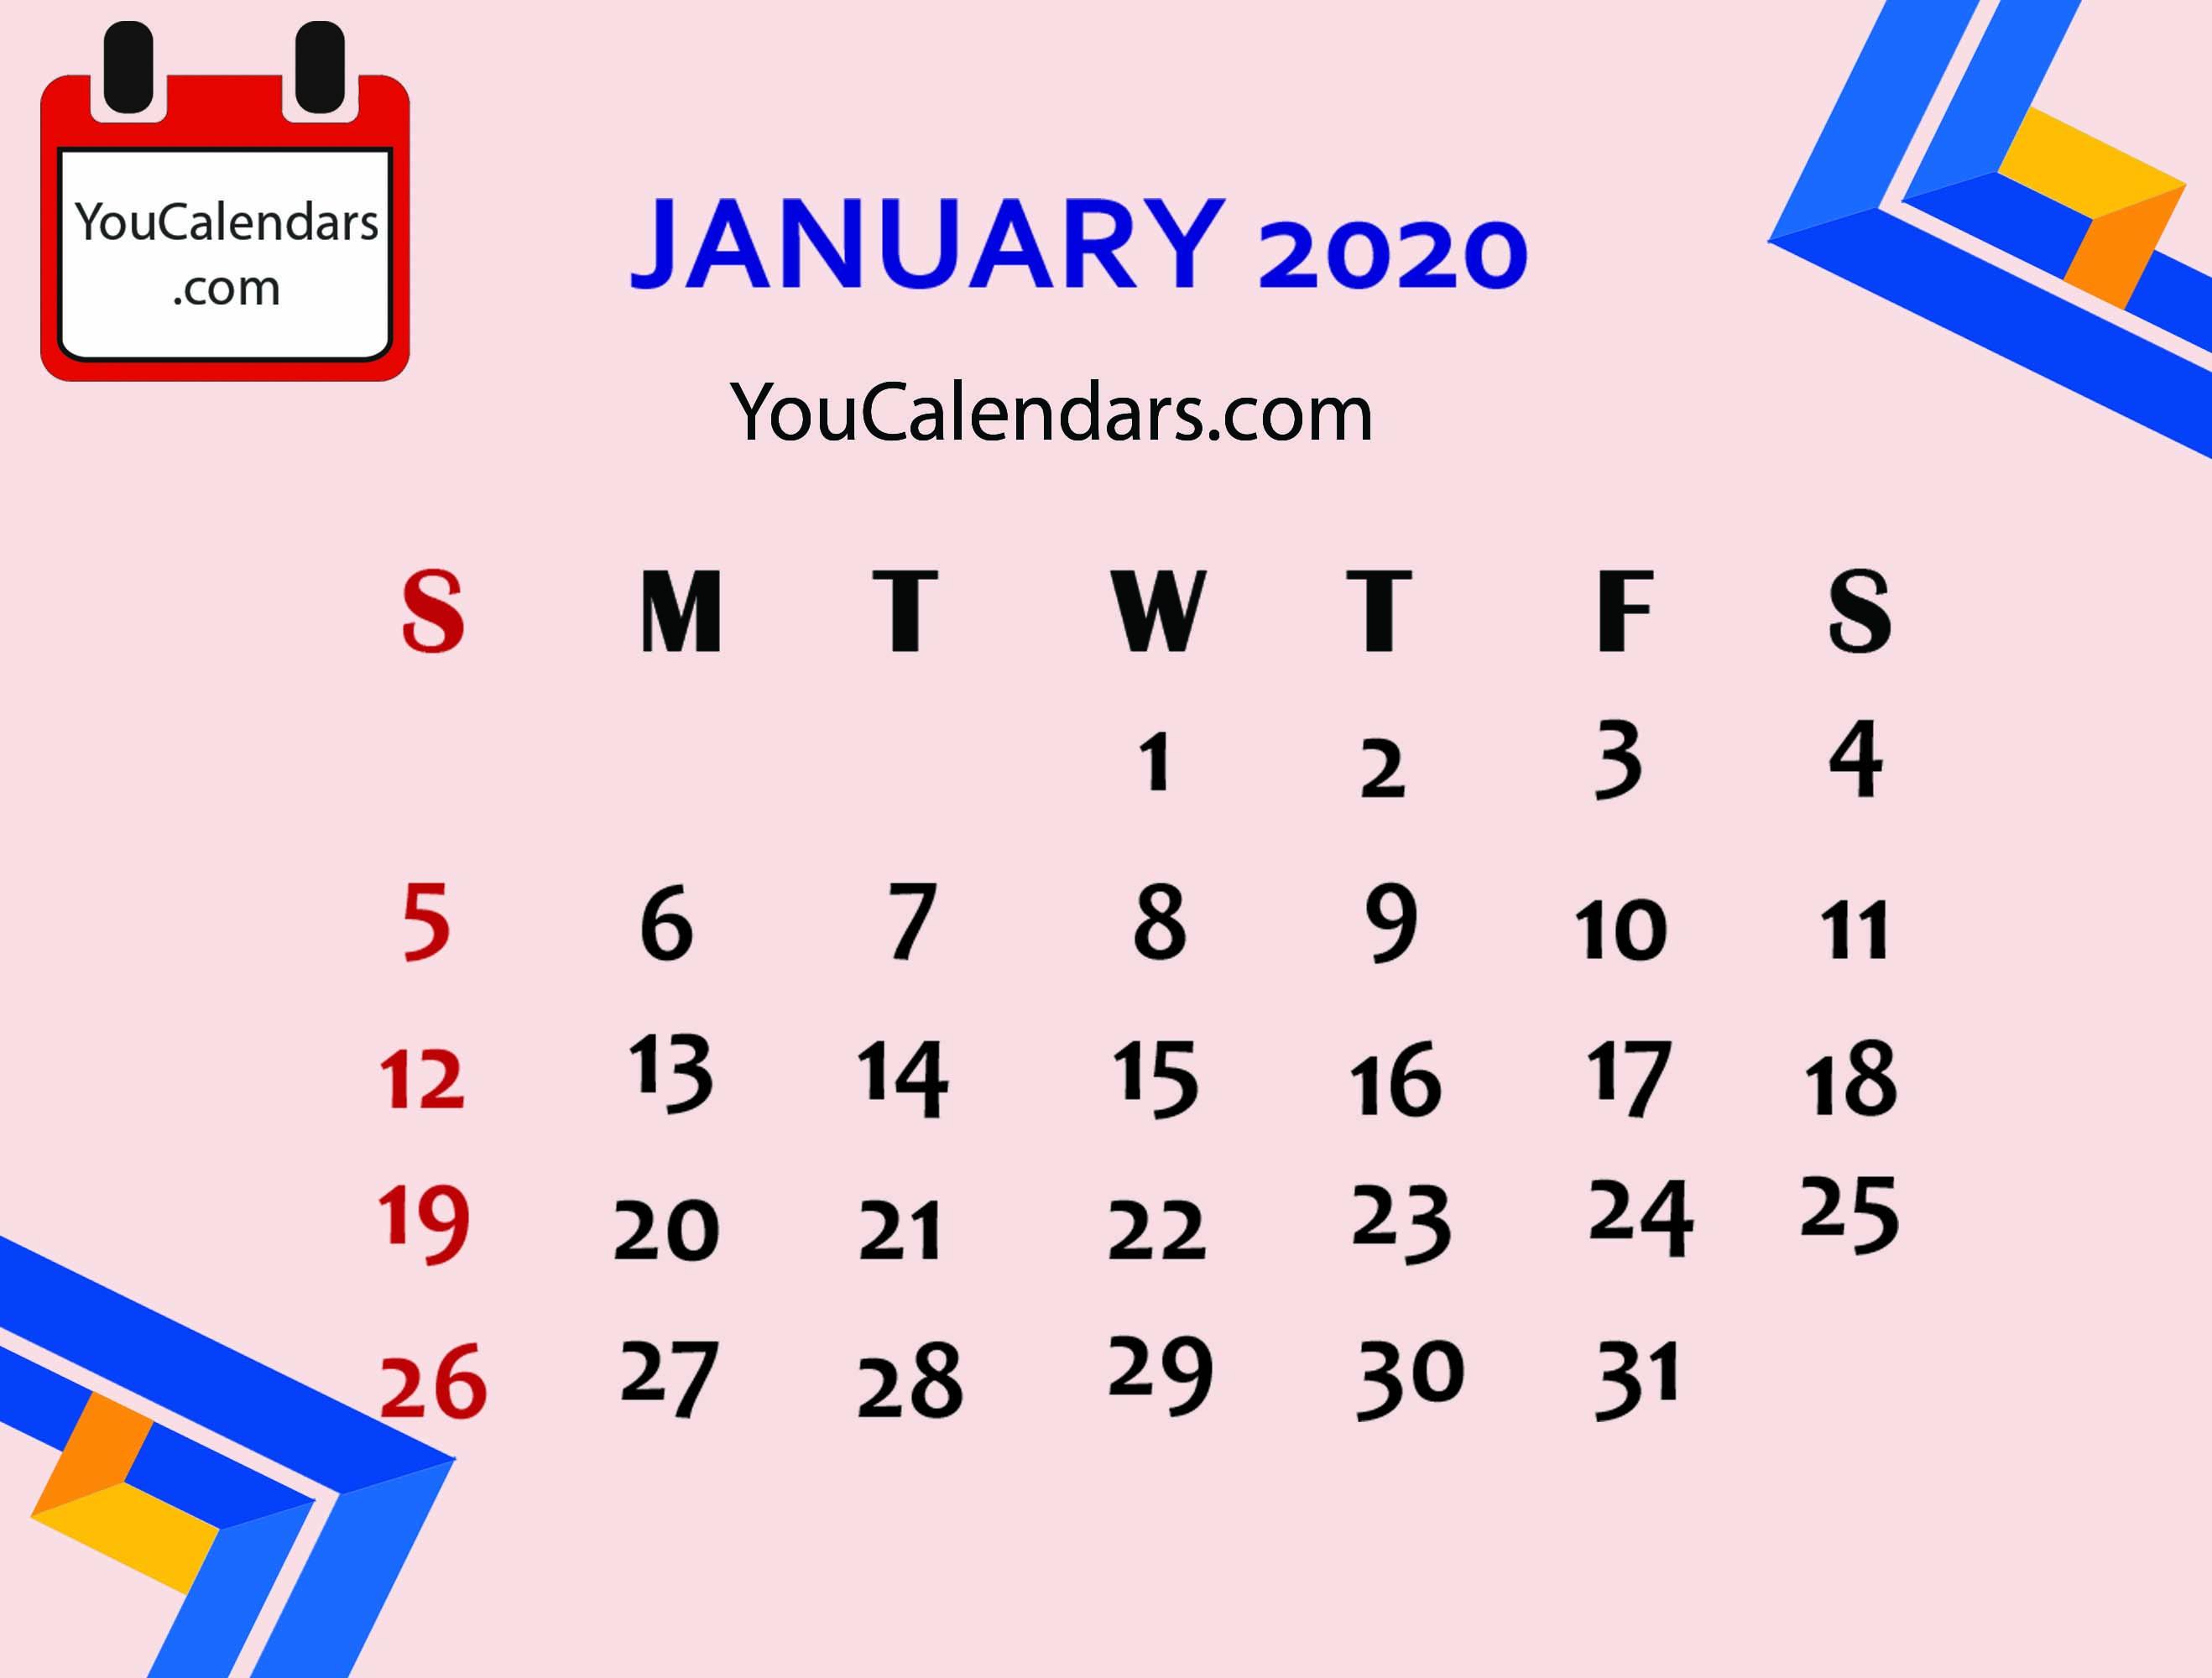 ✅Free January 2020 Calendar Printable Template - You Calendars inside Employee Attendance Calendar 2020 Prntable